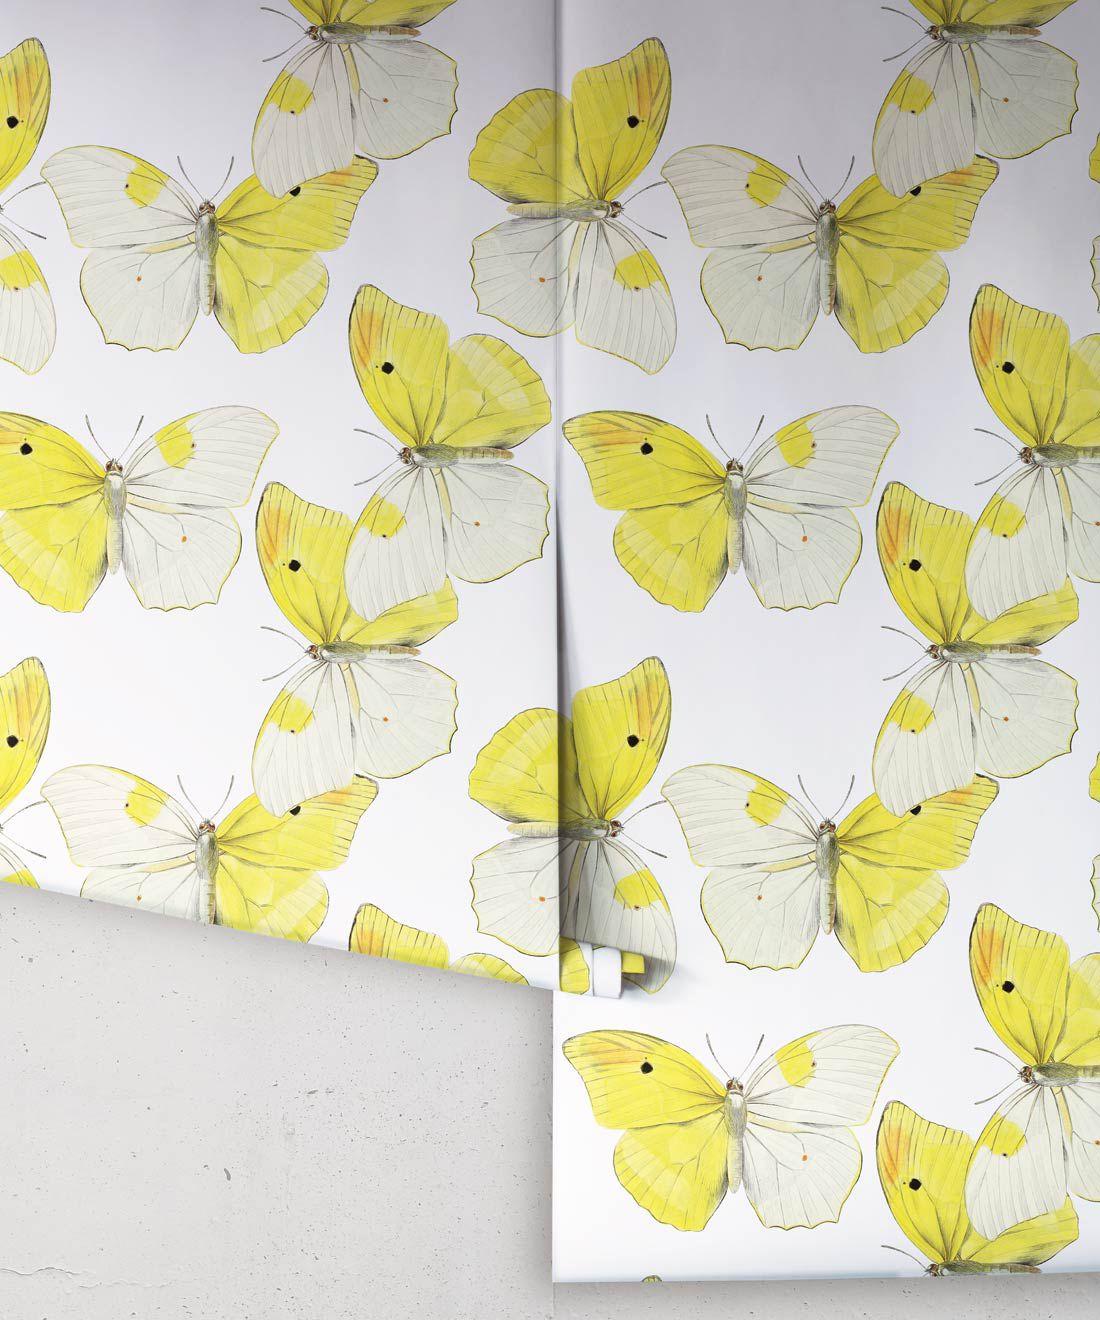 Blended Butterfly Wallpaper • White & Yellow Butterflies Wallpaper •Rolls